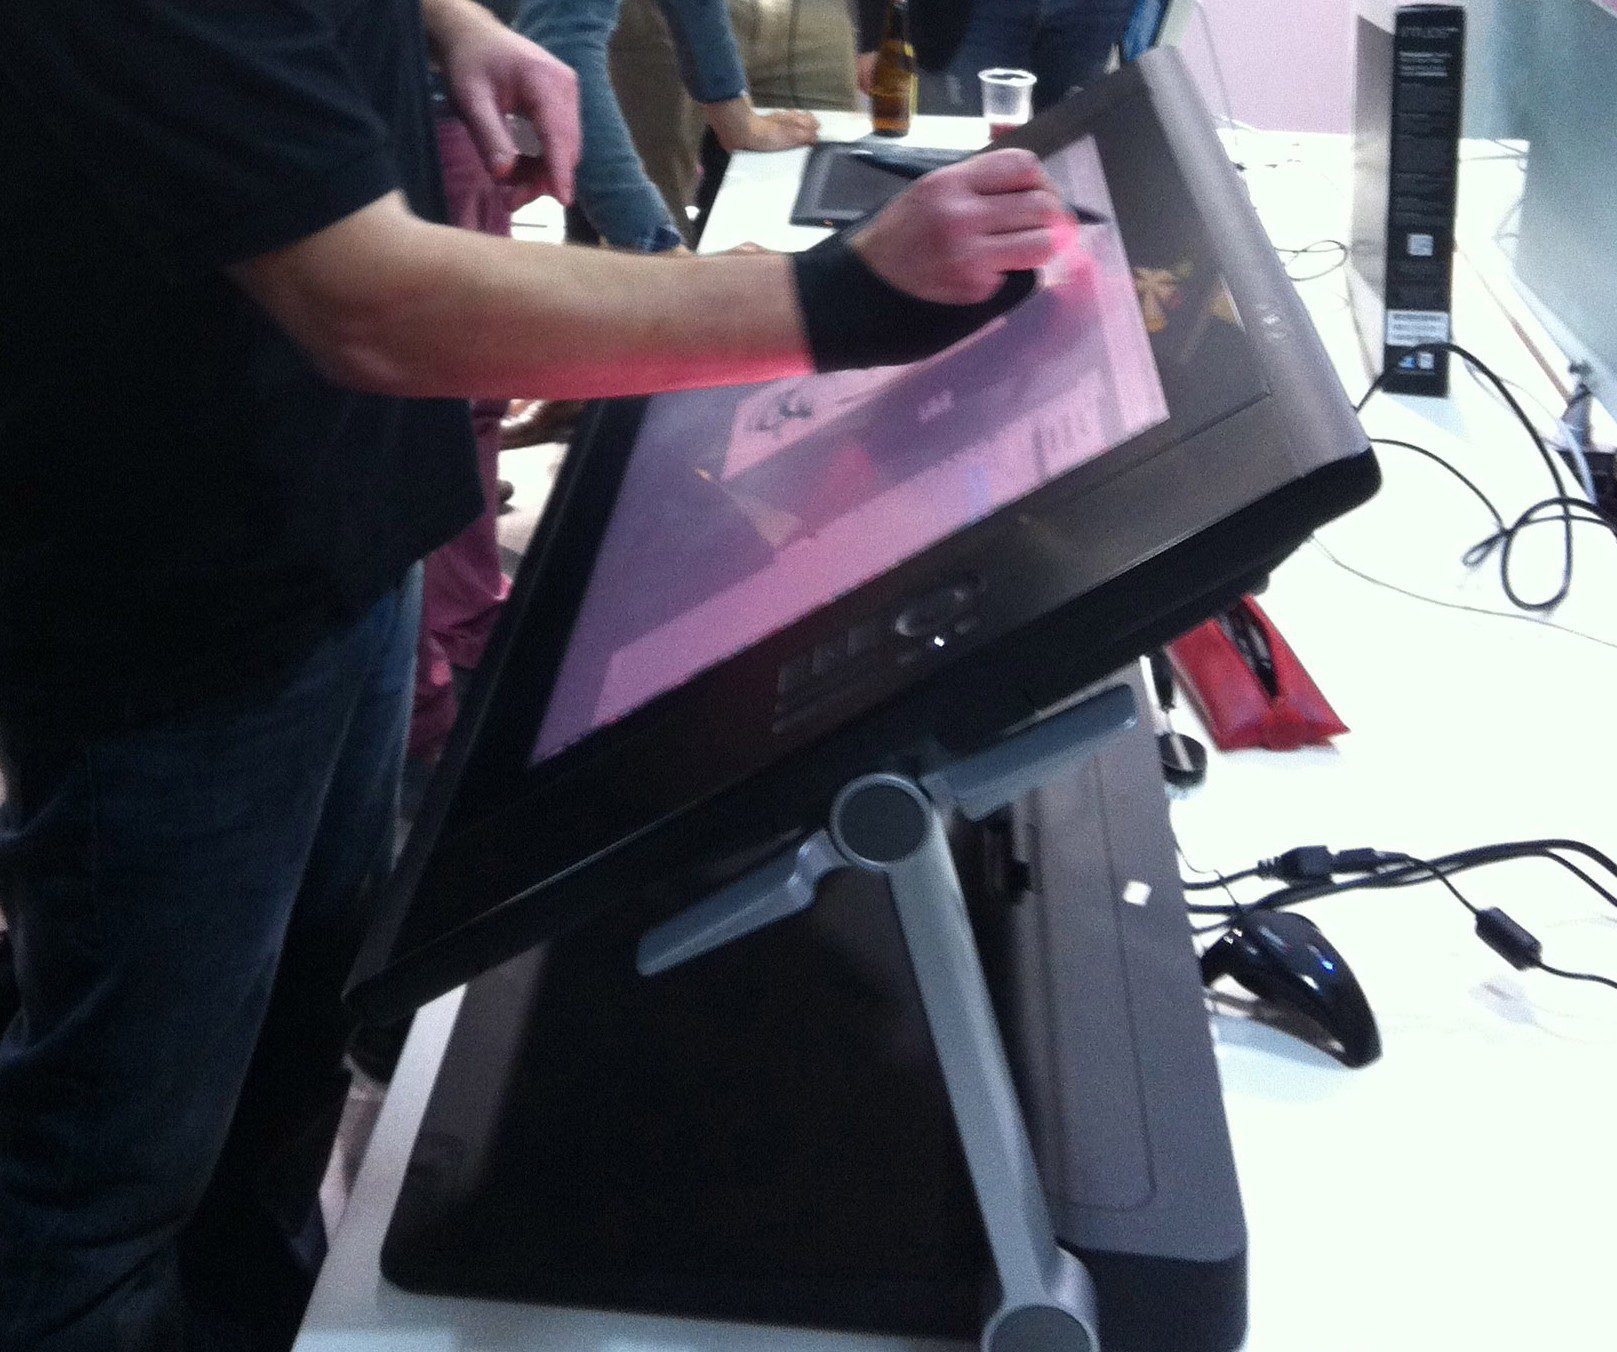 On a essayé la Cintiq 24HD Touch